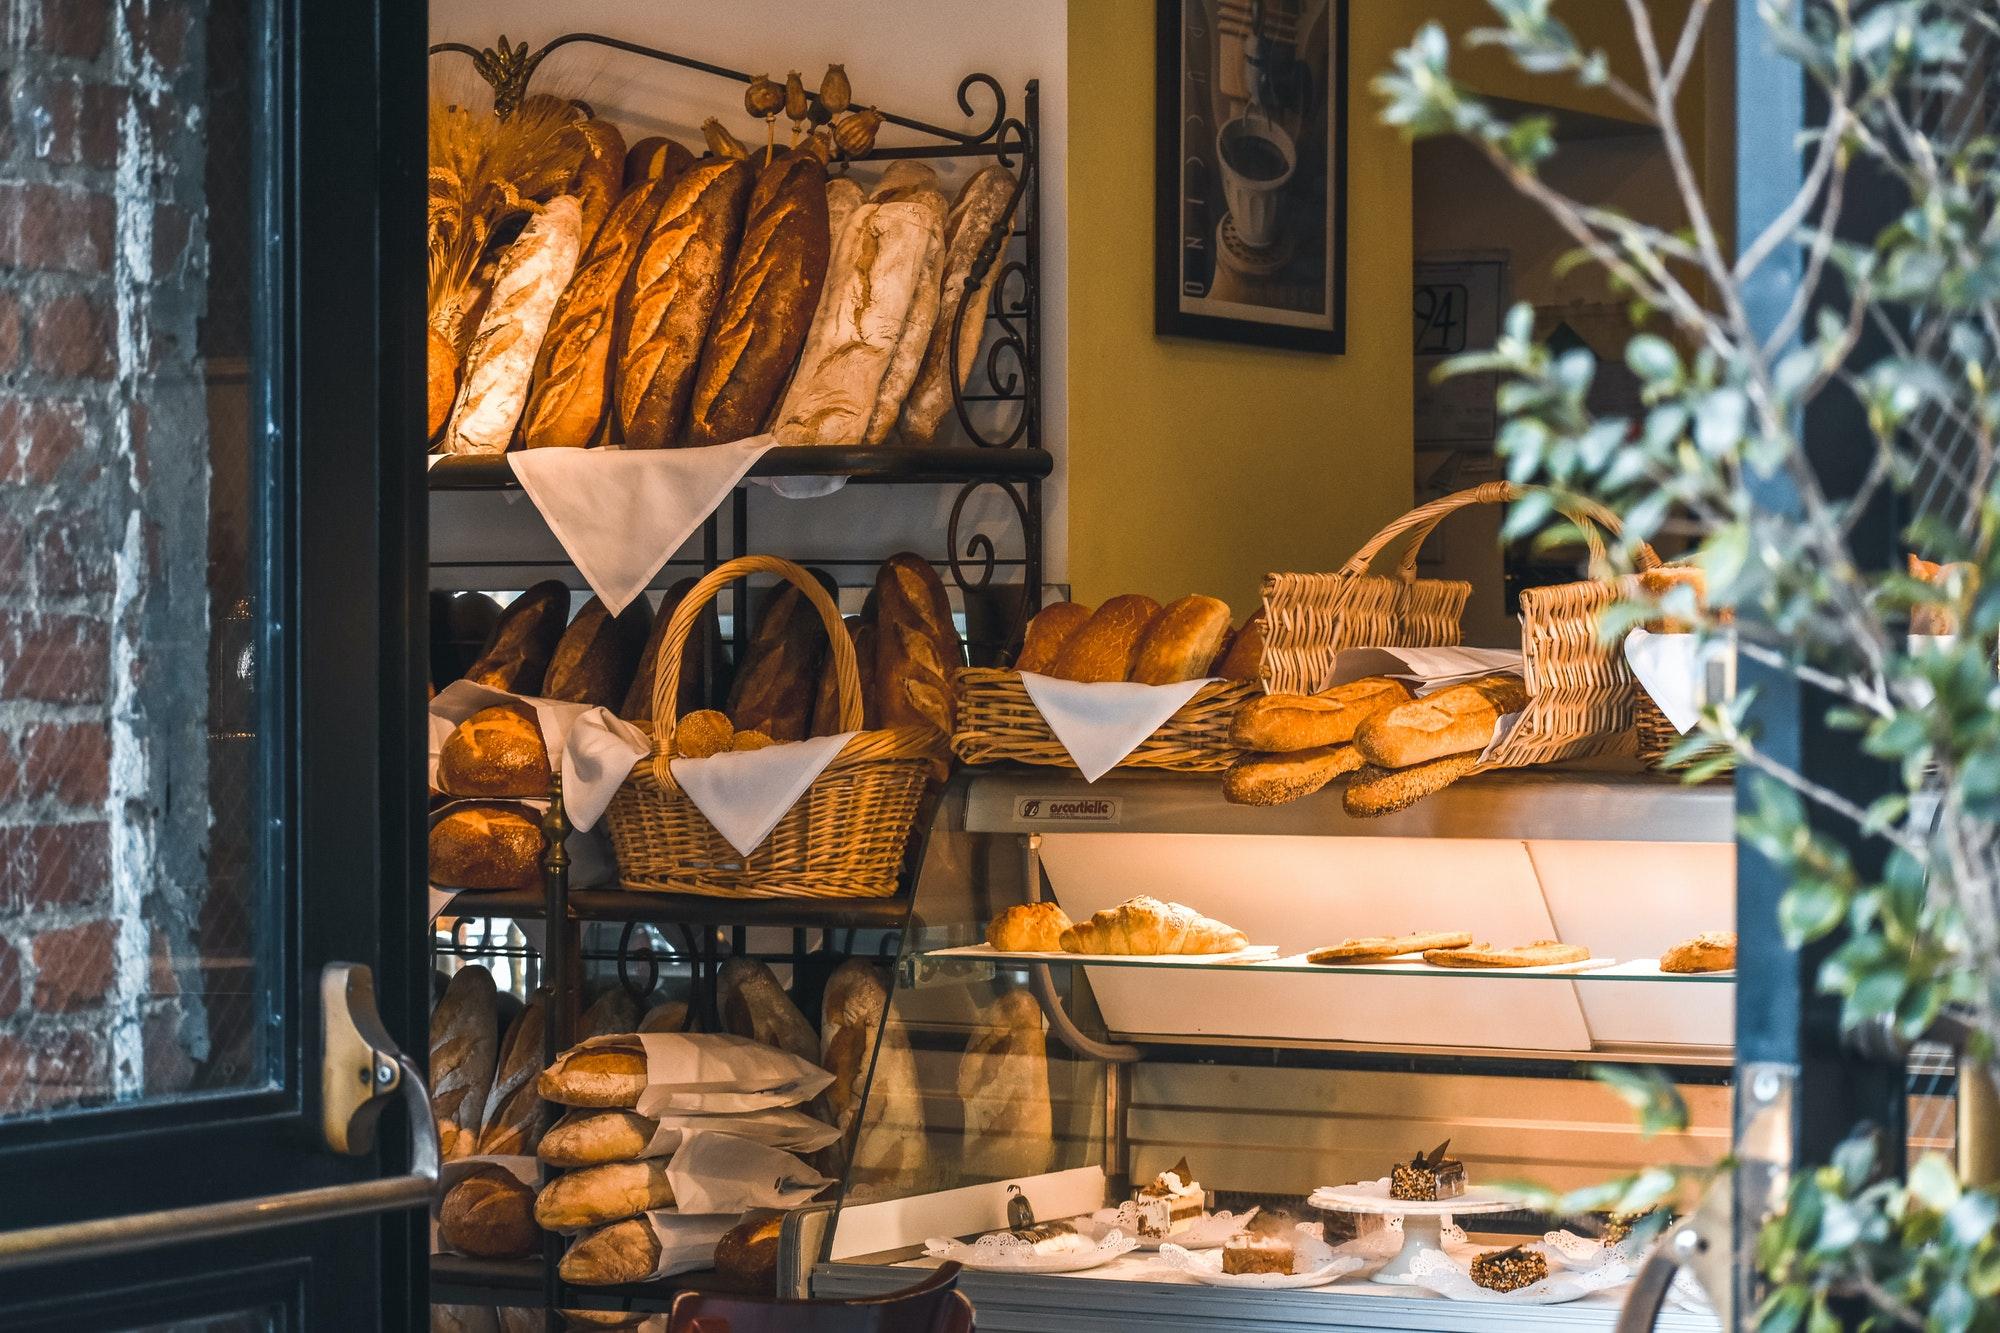 Small Bakery Shop